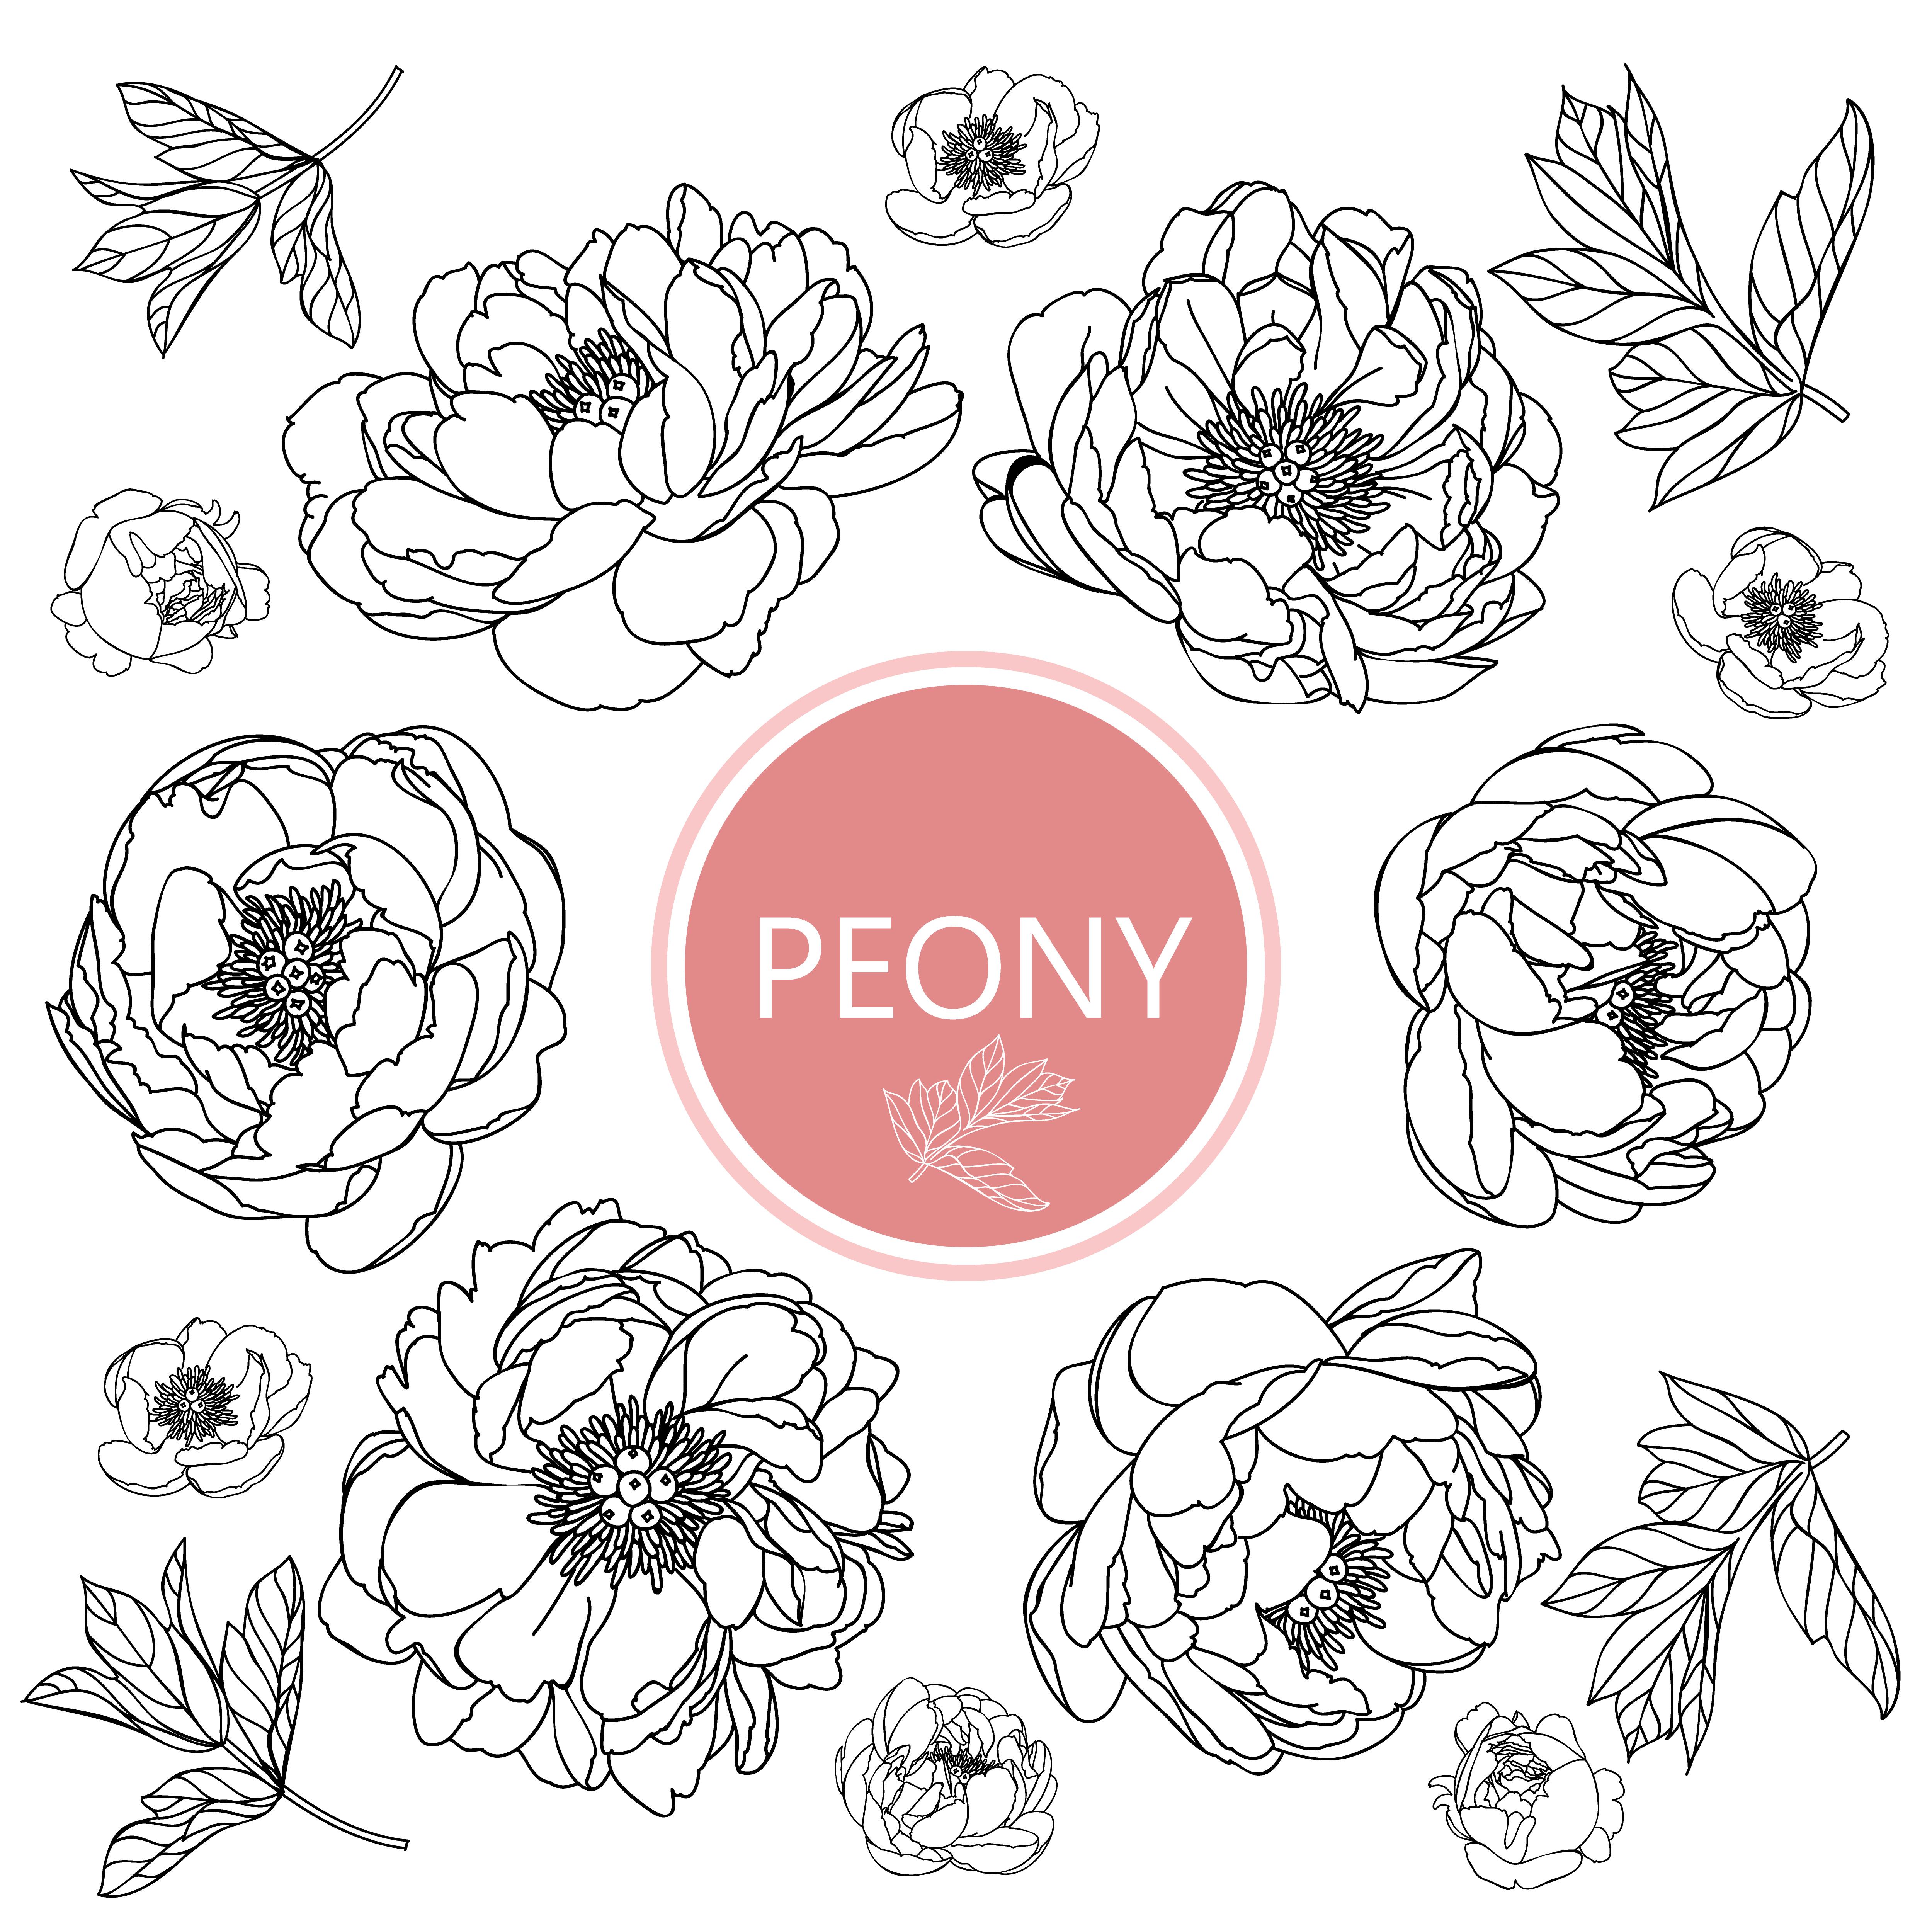 Peony flowers set